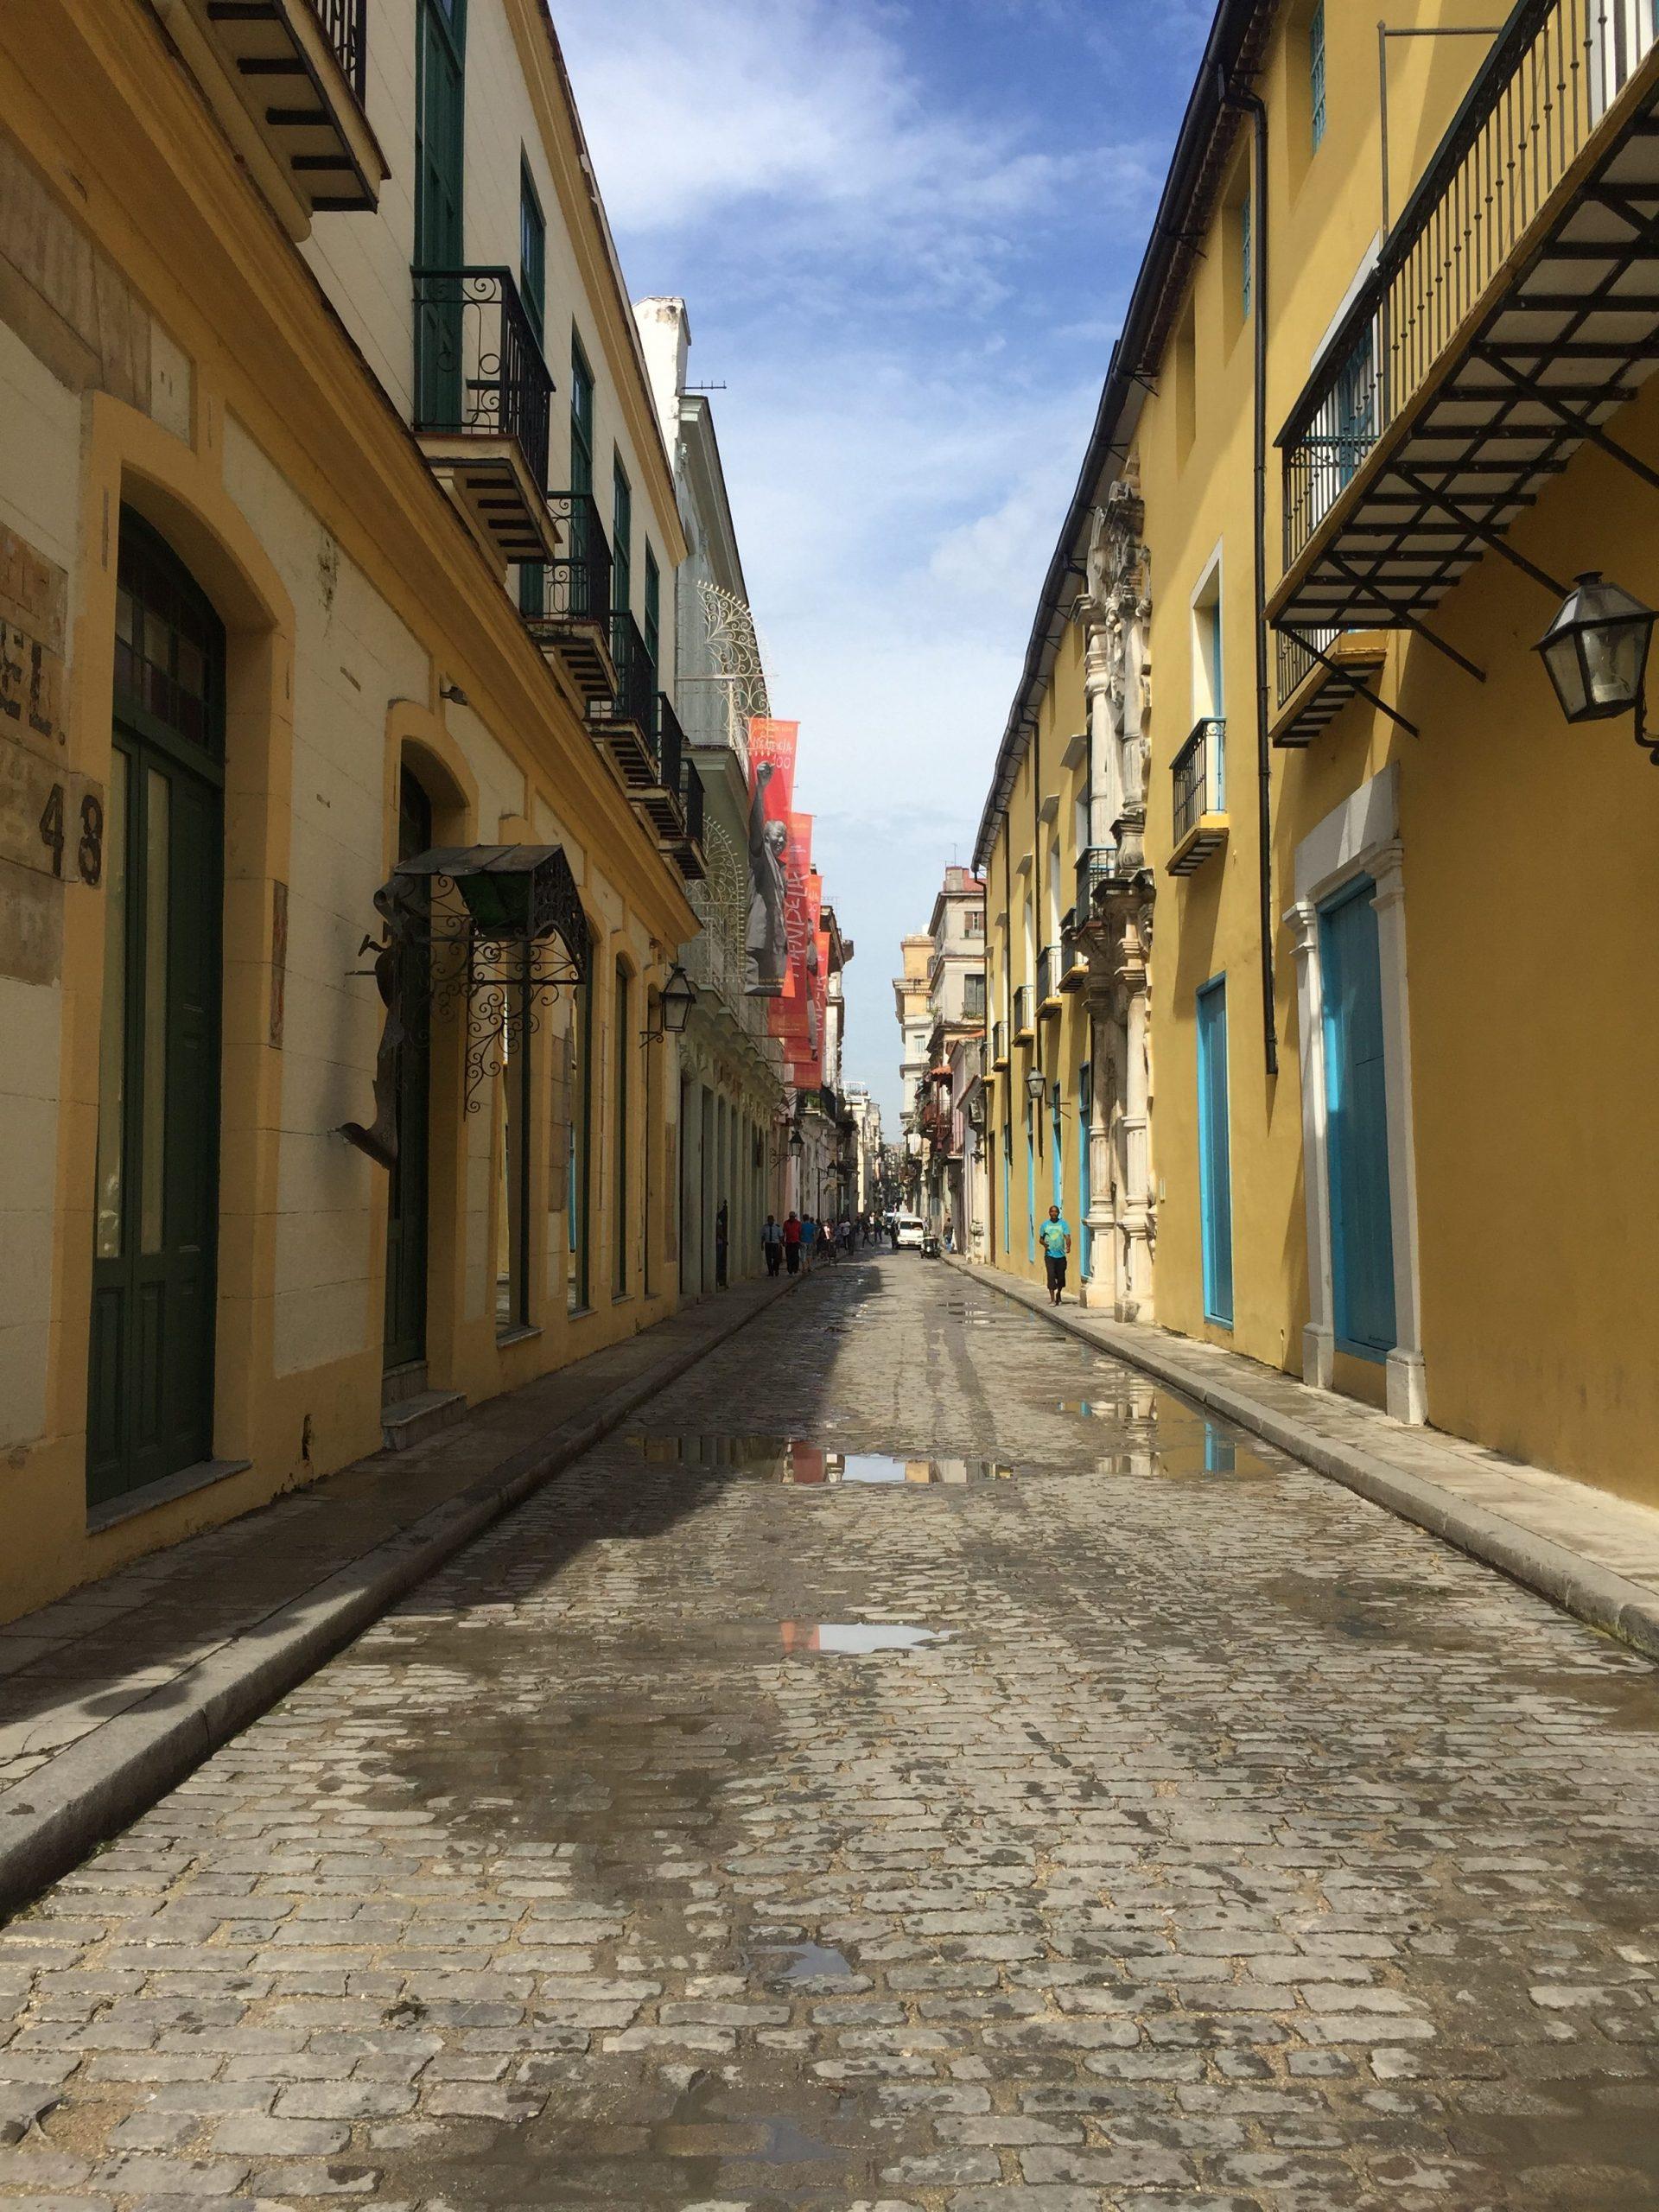 Cuba Travel Guide